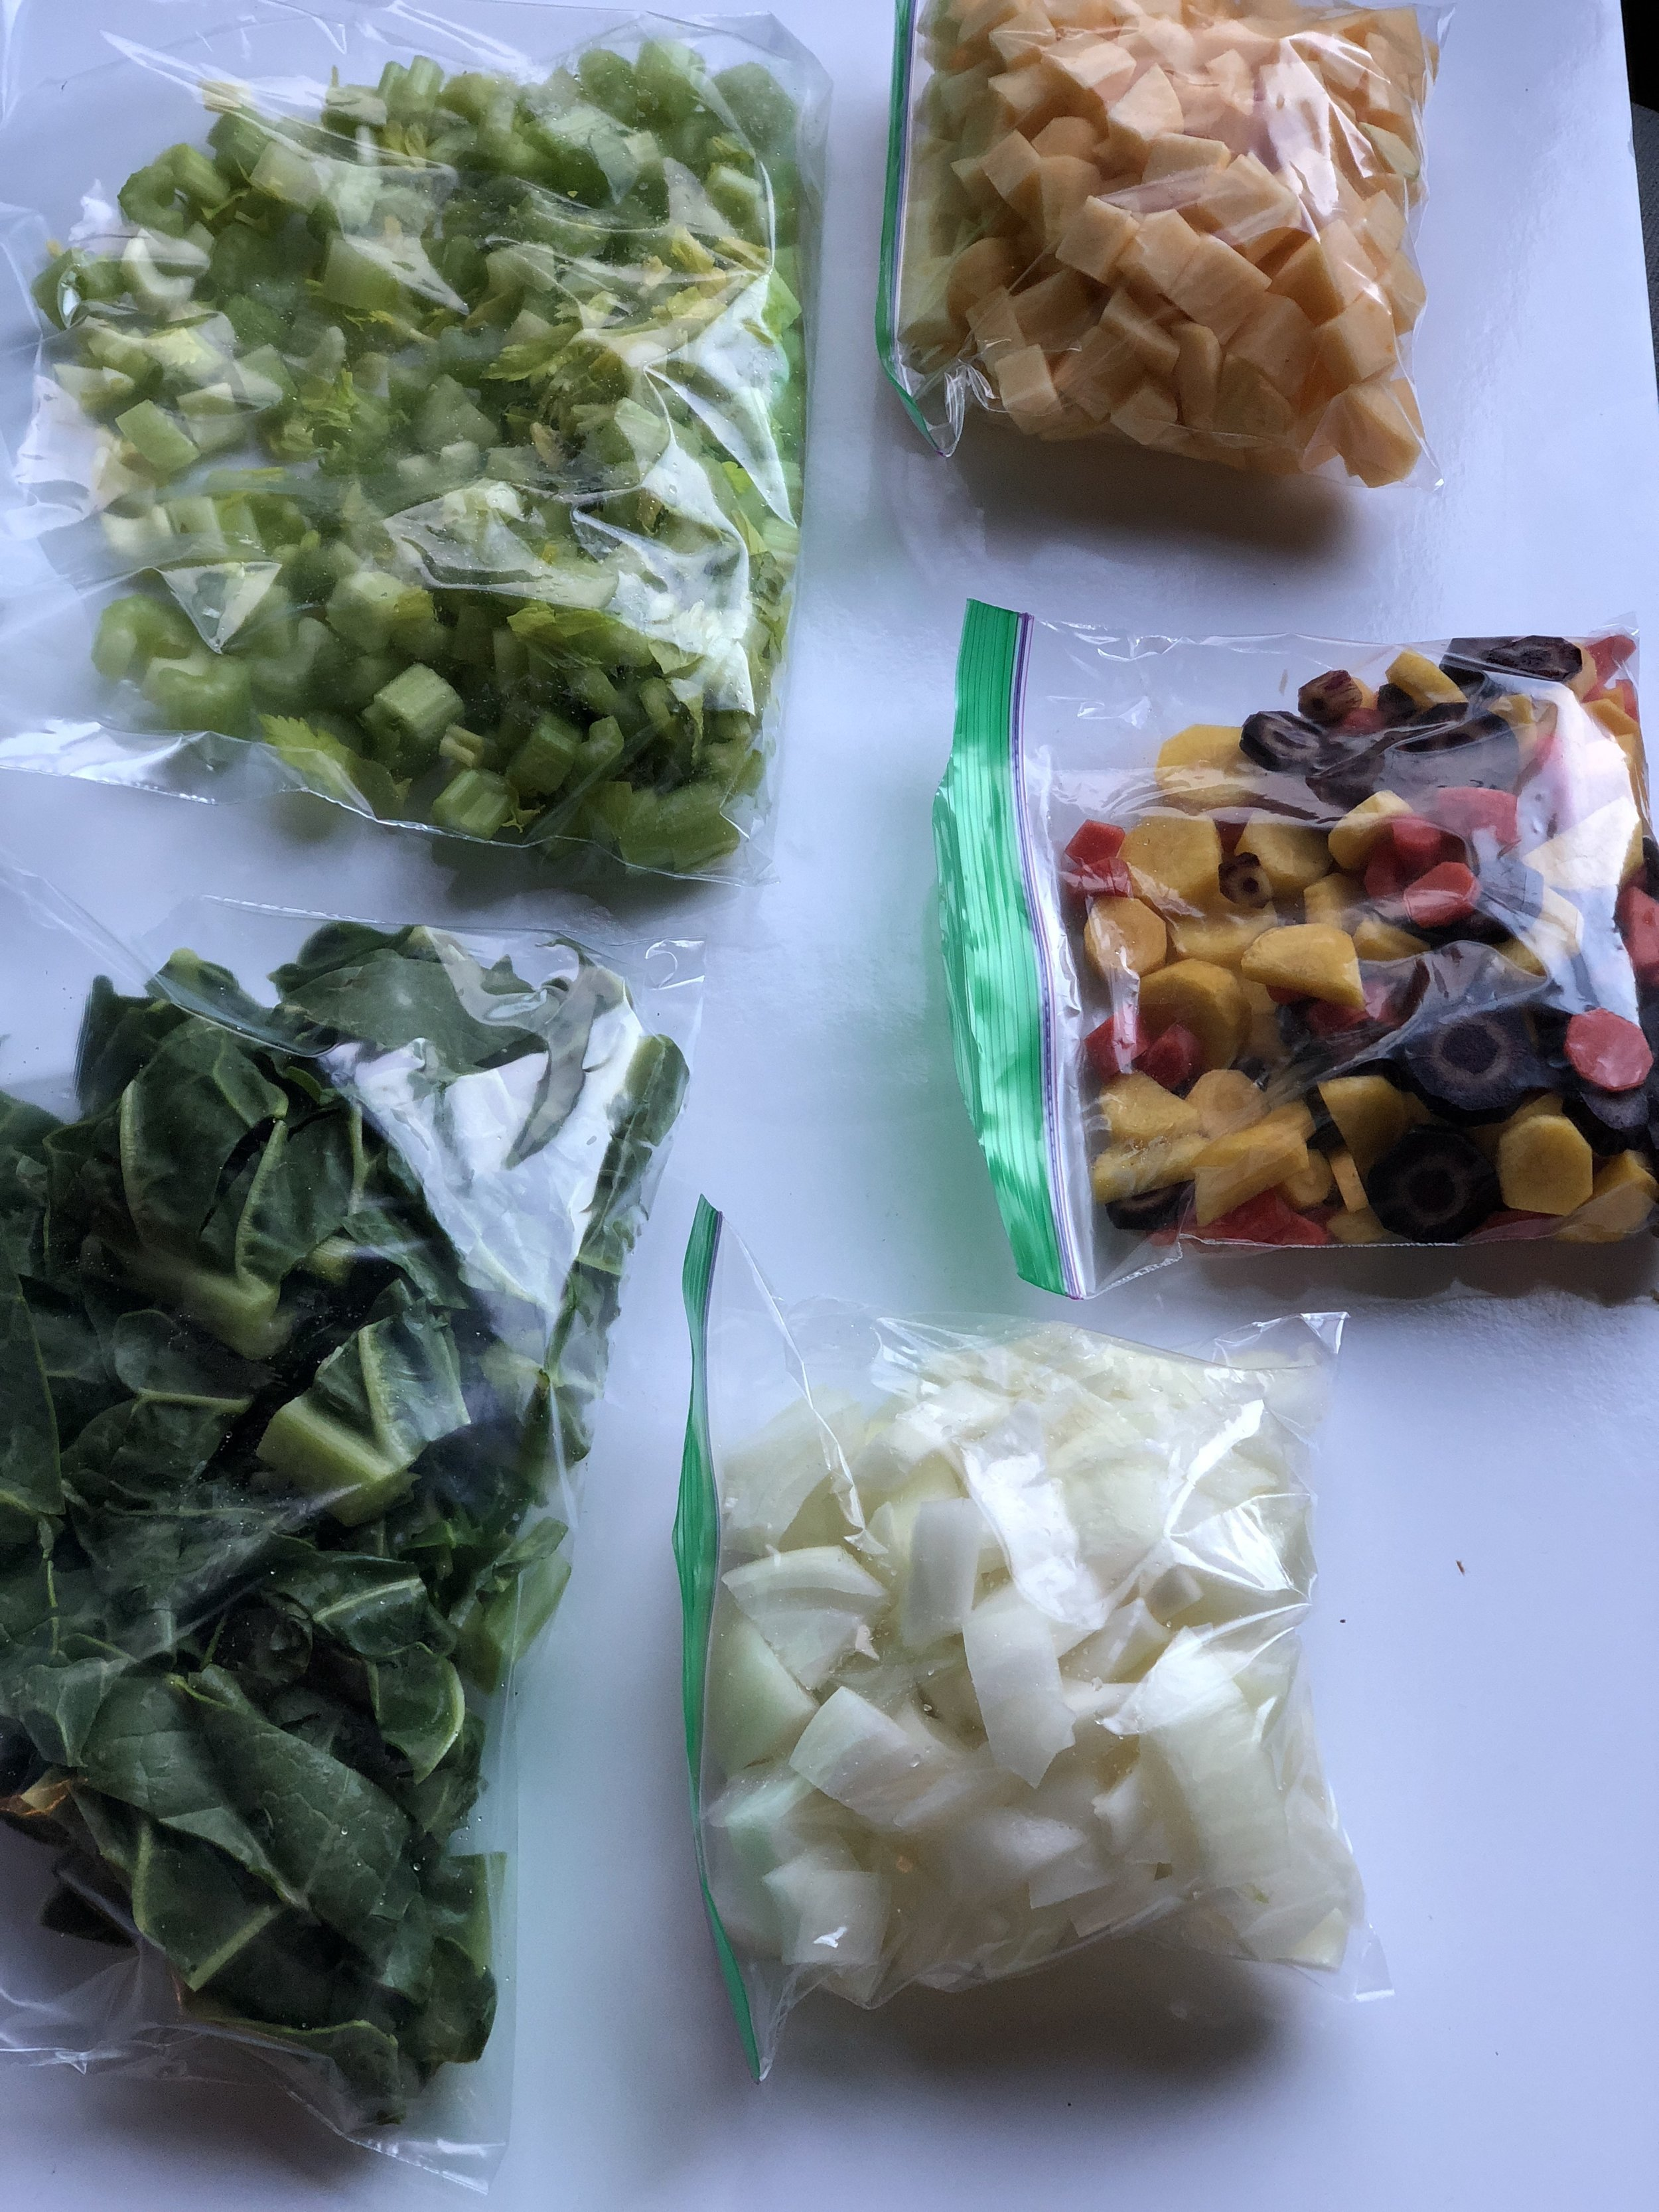 almonds and asana pasta e fagioli prep.JPG